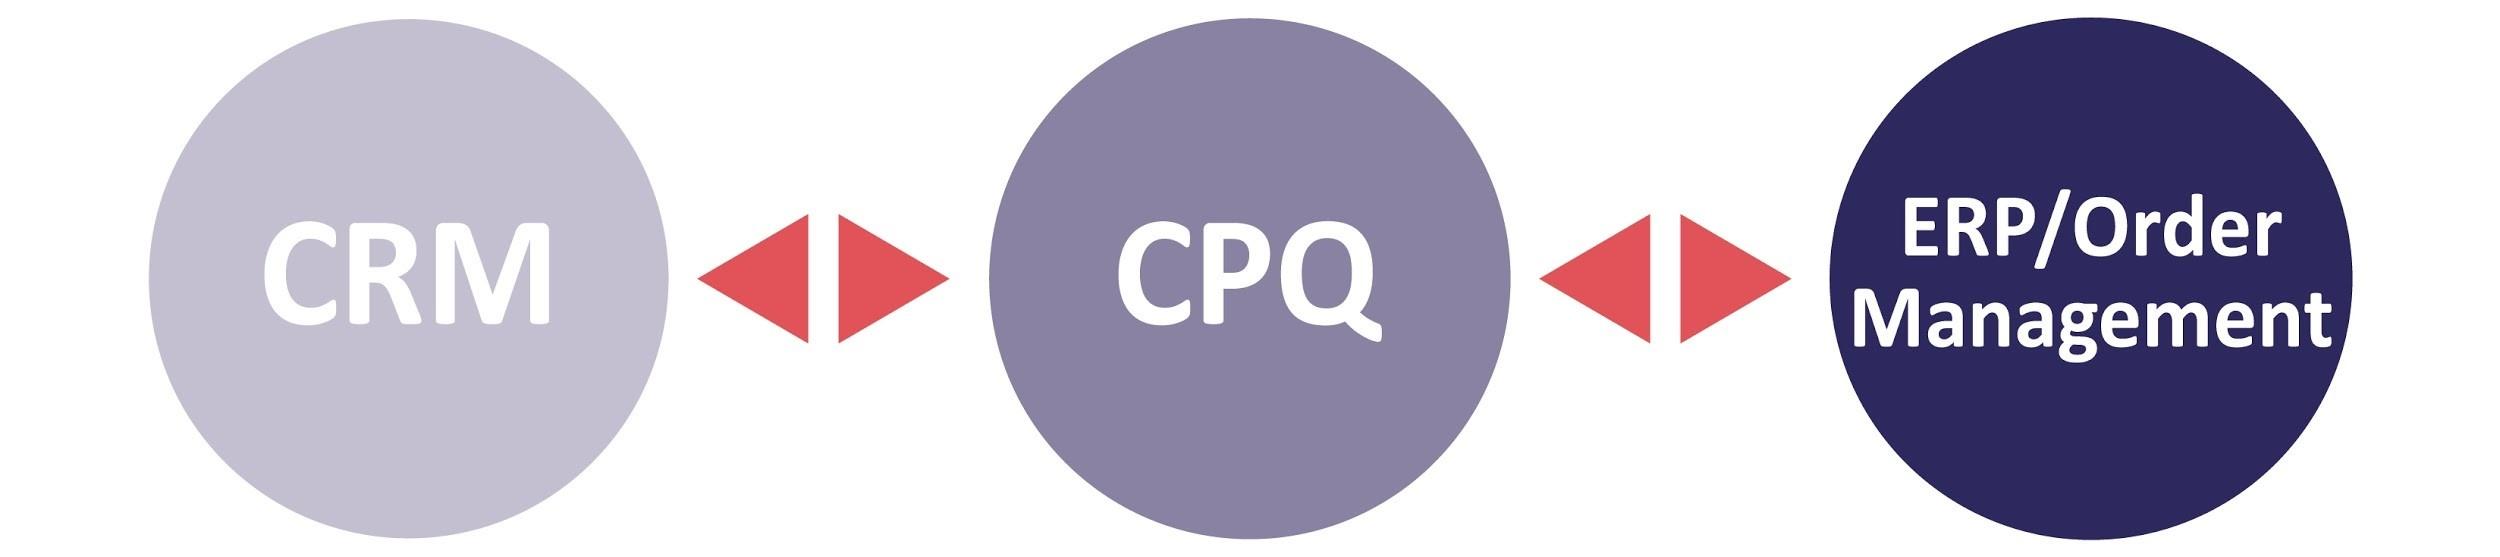 crm cpq erp integration